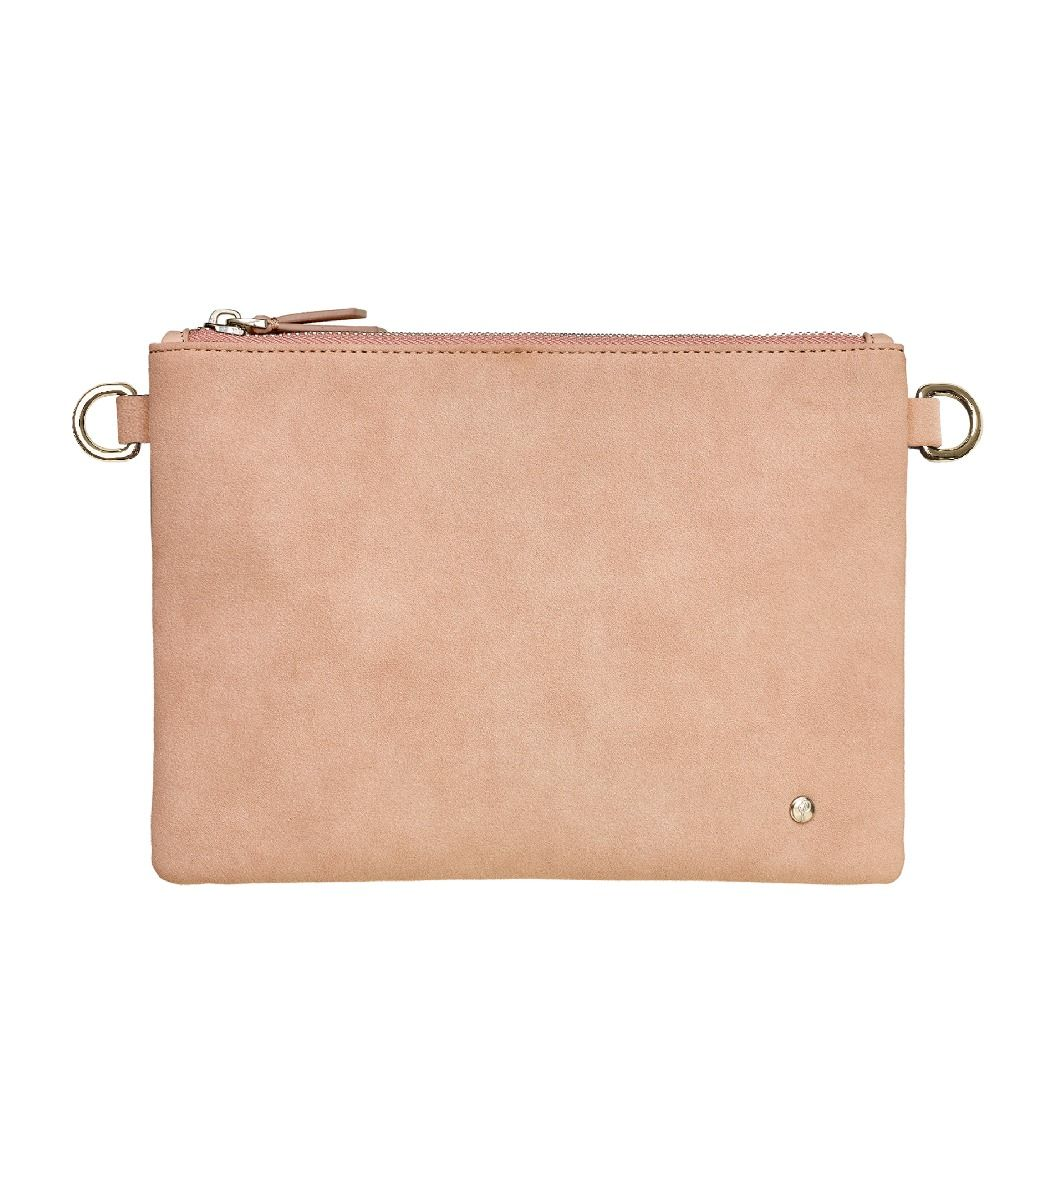 edblad-irene-small-bag-peony-front-pi.jpg